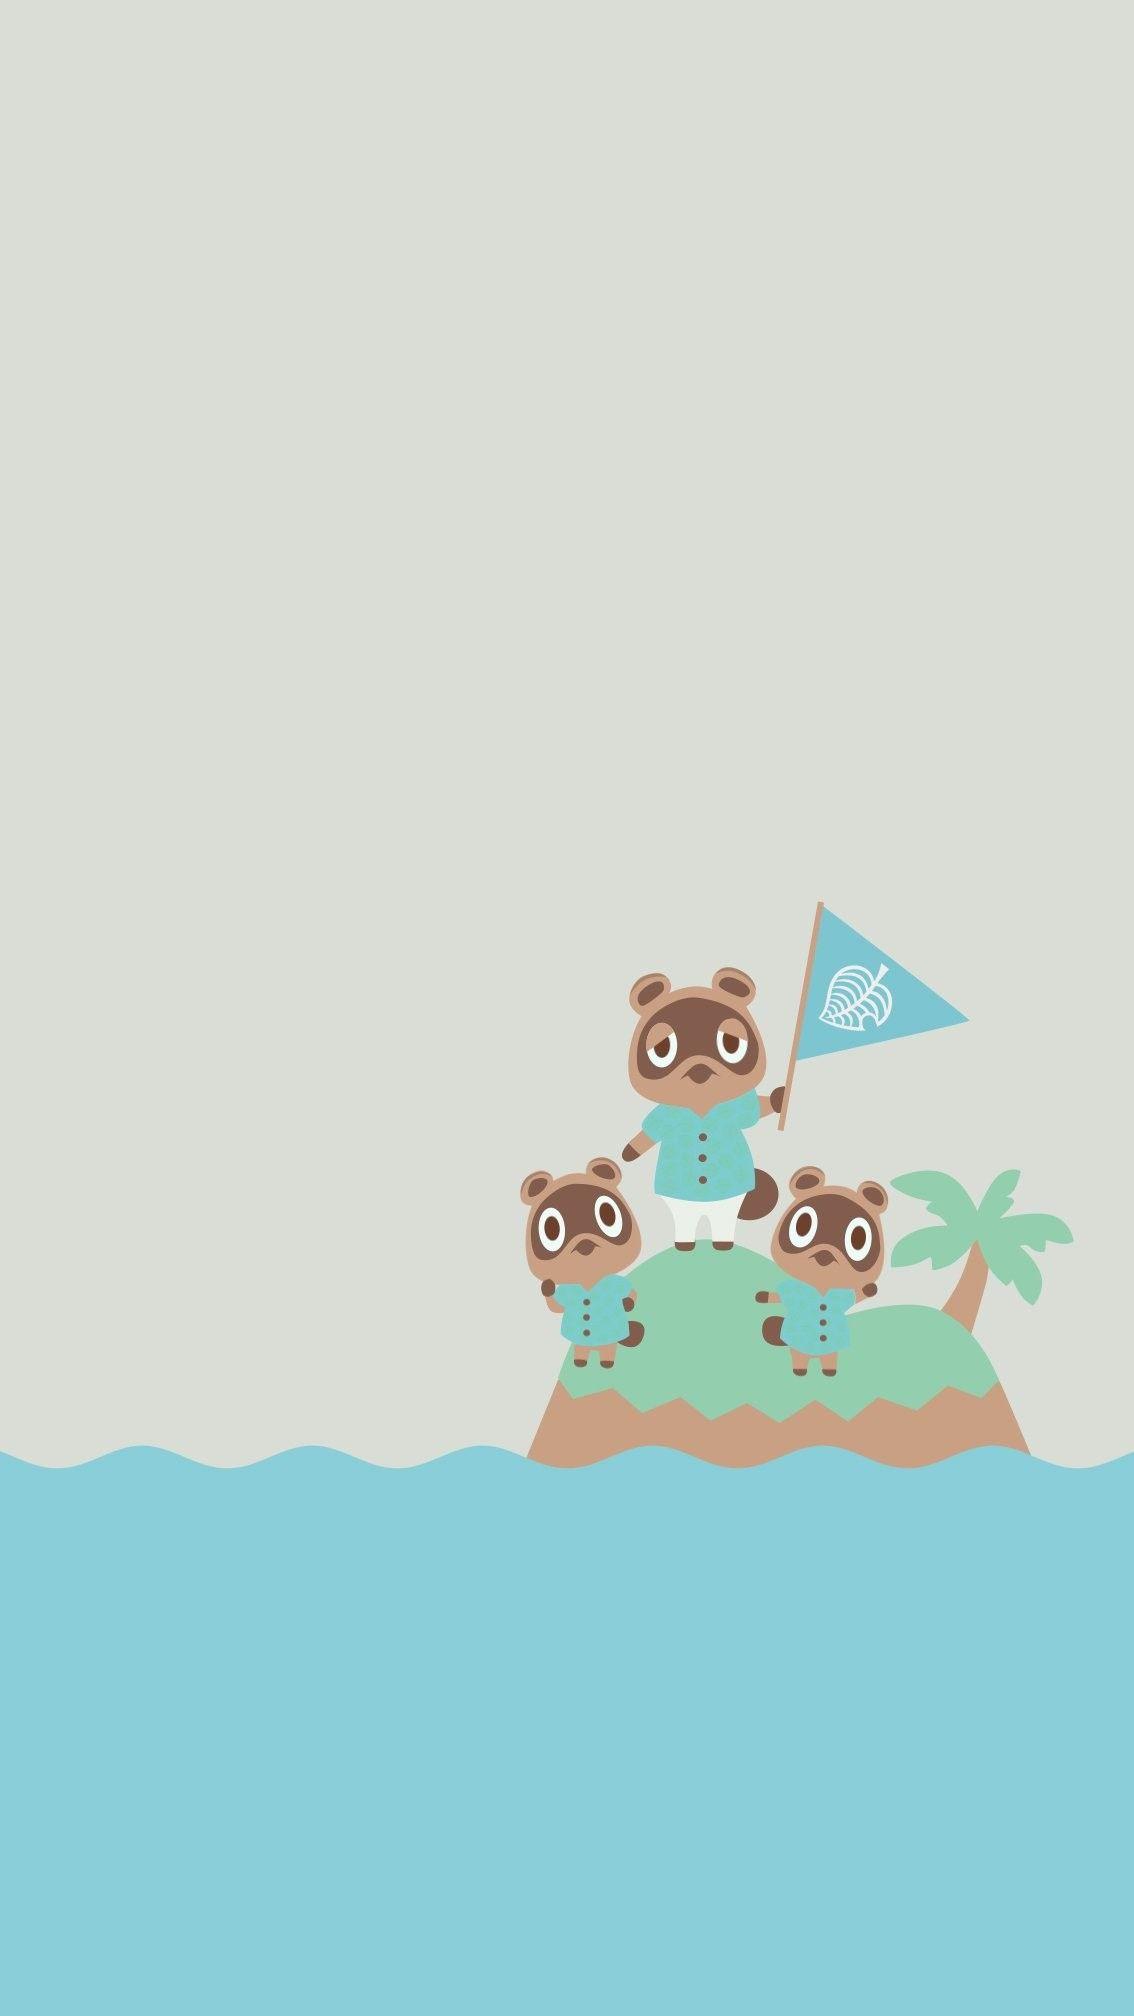 Animal Crossing New Horizons Iphone 11 Wallpaper Wallpapershit